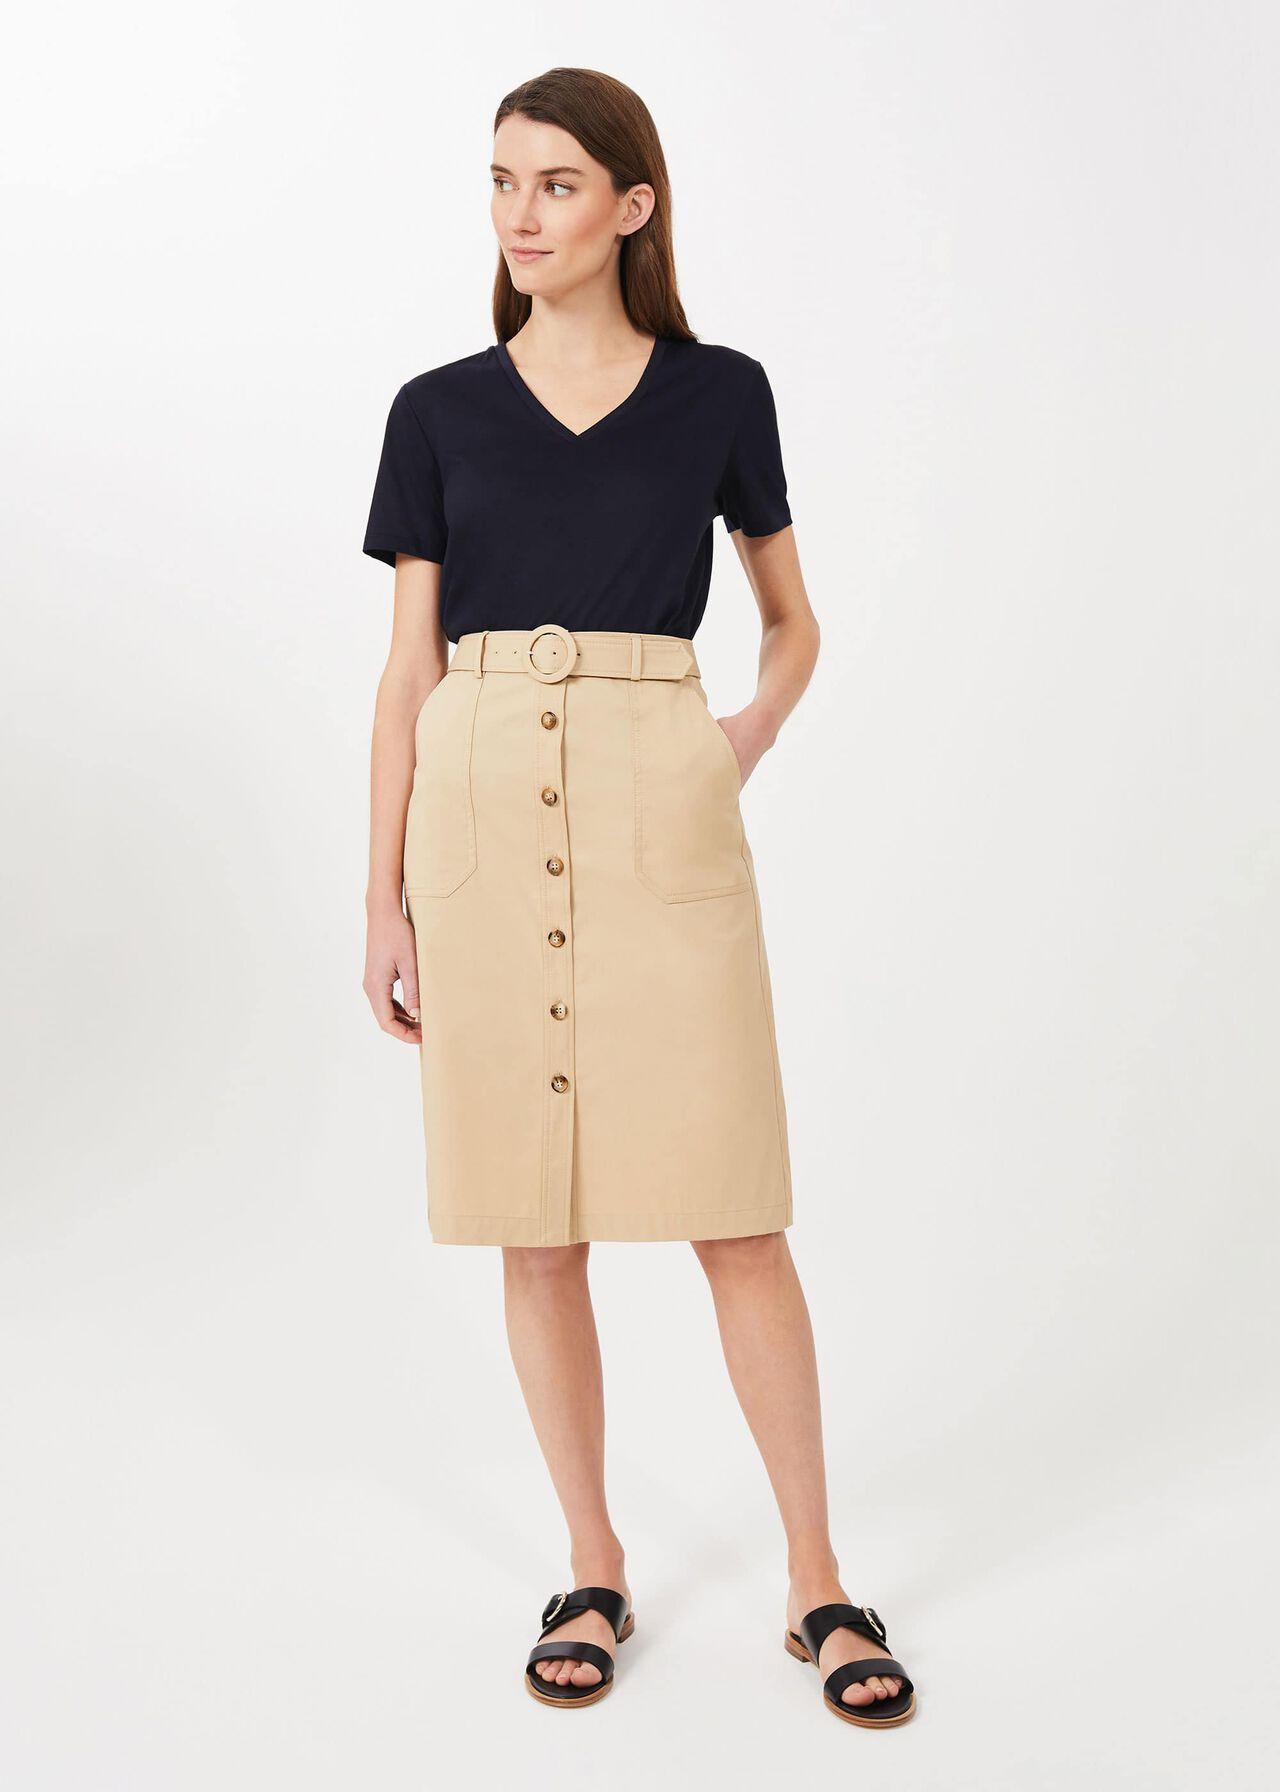 Adaline Skirt, Sand, hi-res